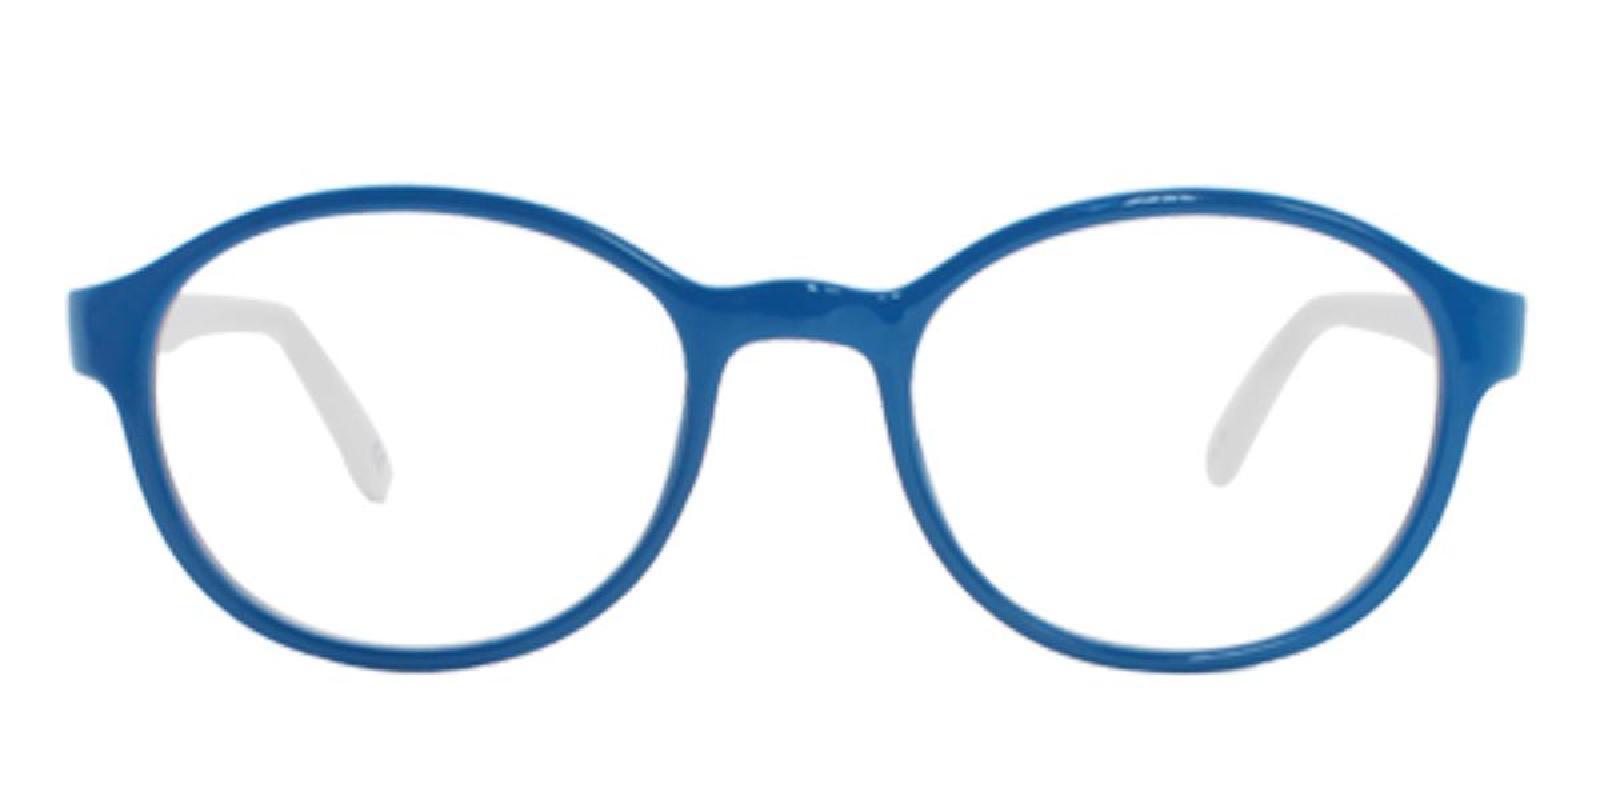 Achiever-Blue-Round-Plastic-Eyeglasses-additional2